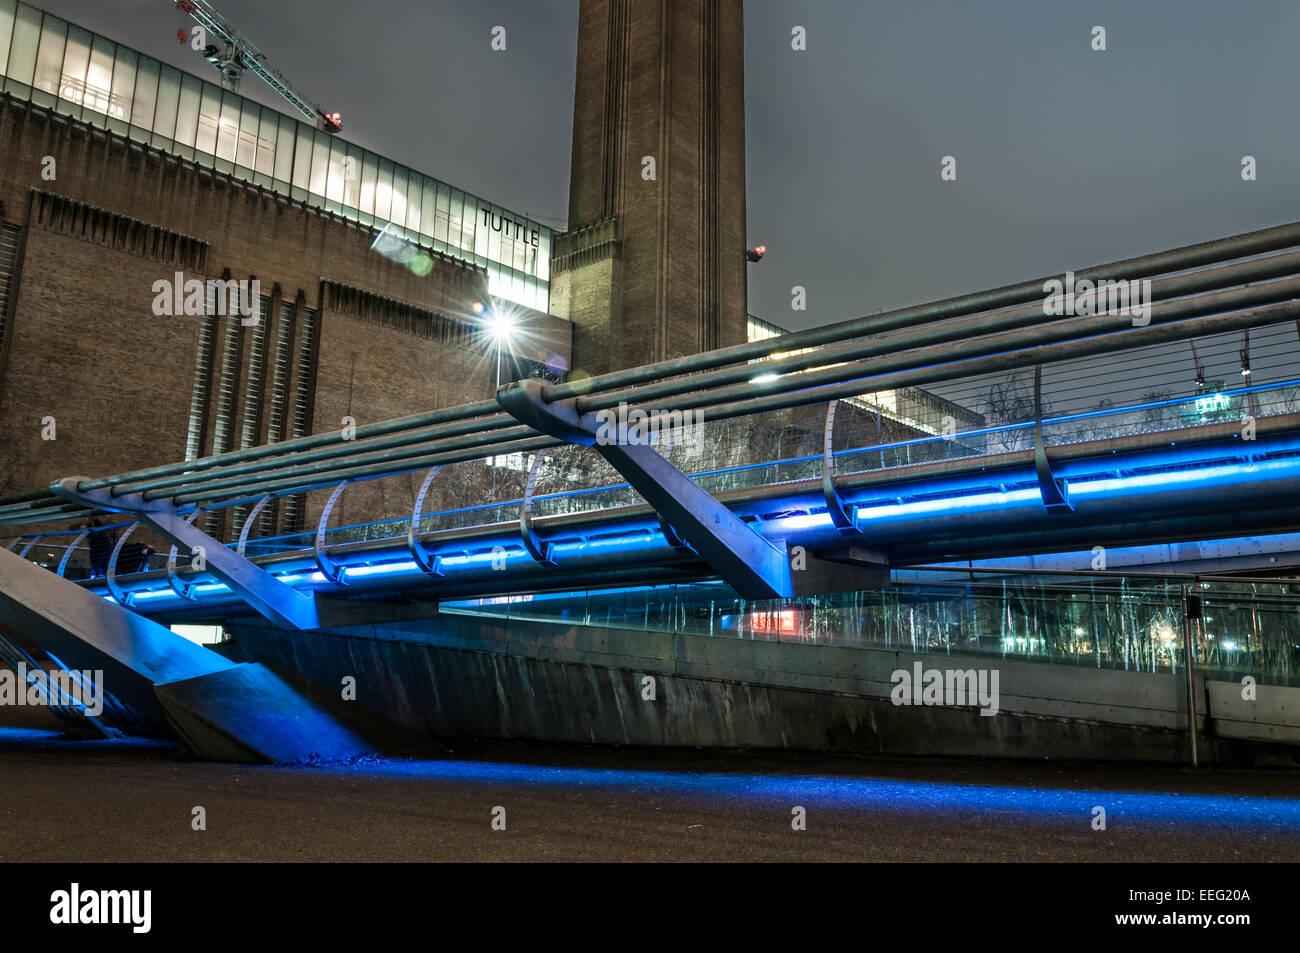 Tate Modern and Millennium bridge at night - Stock Image